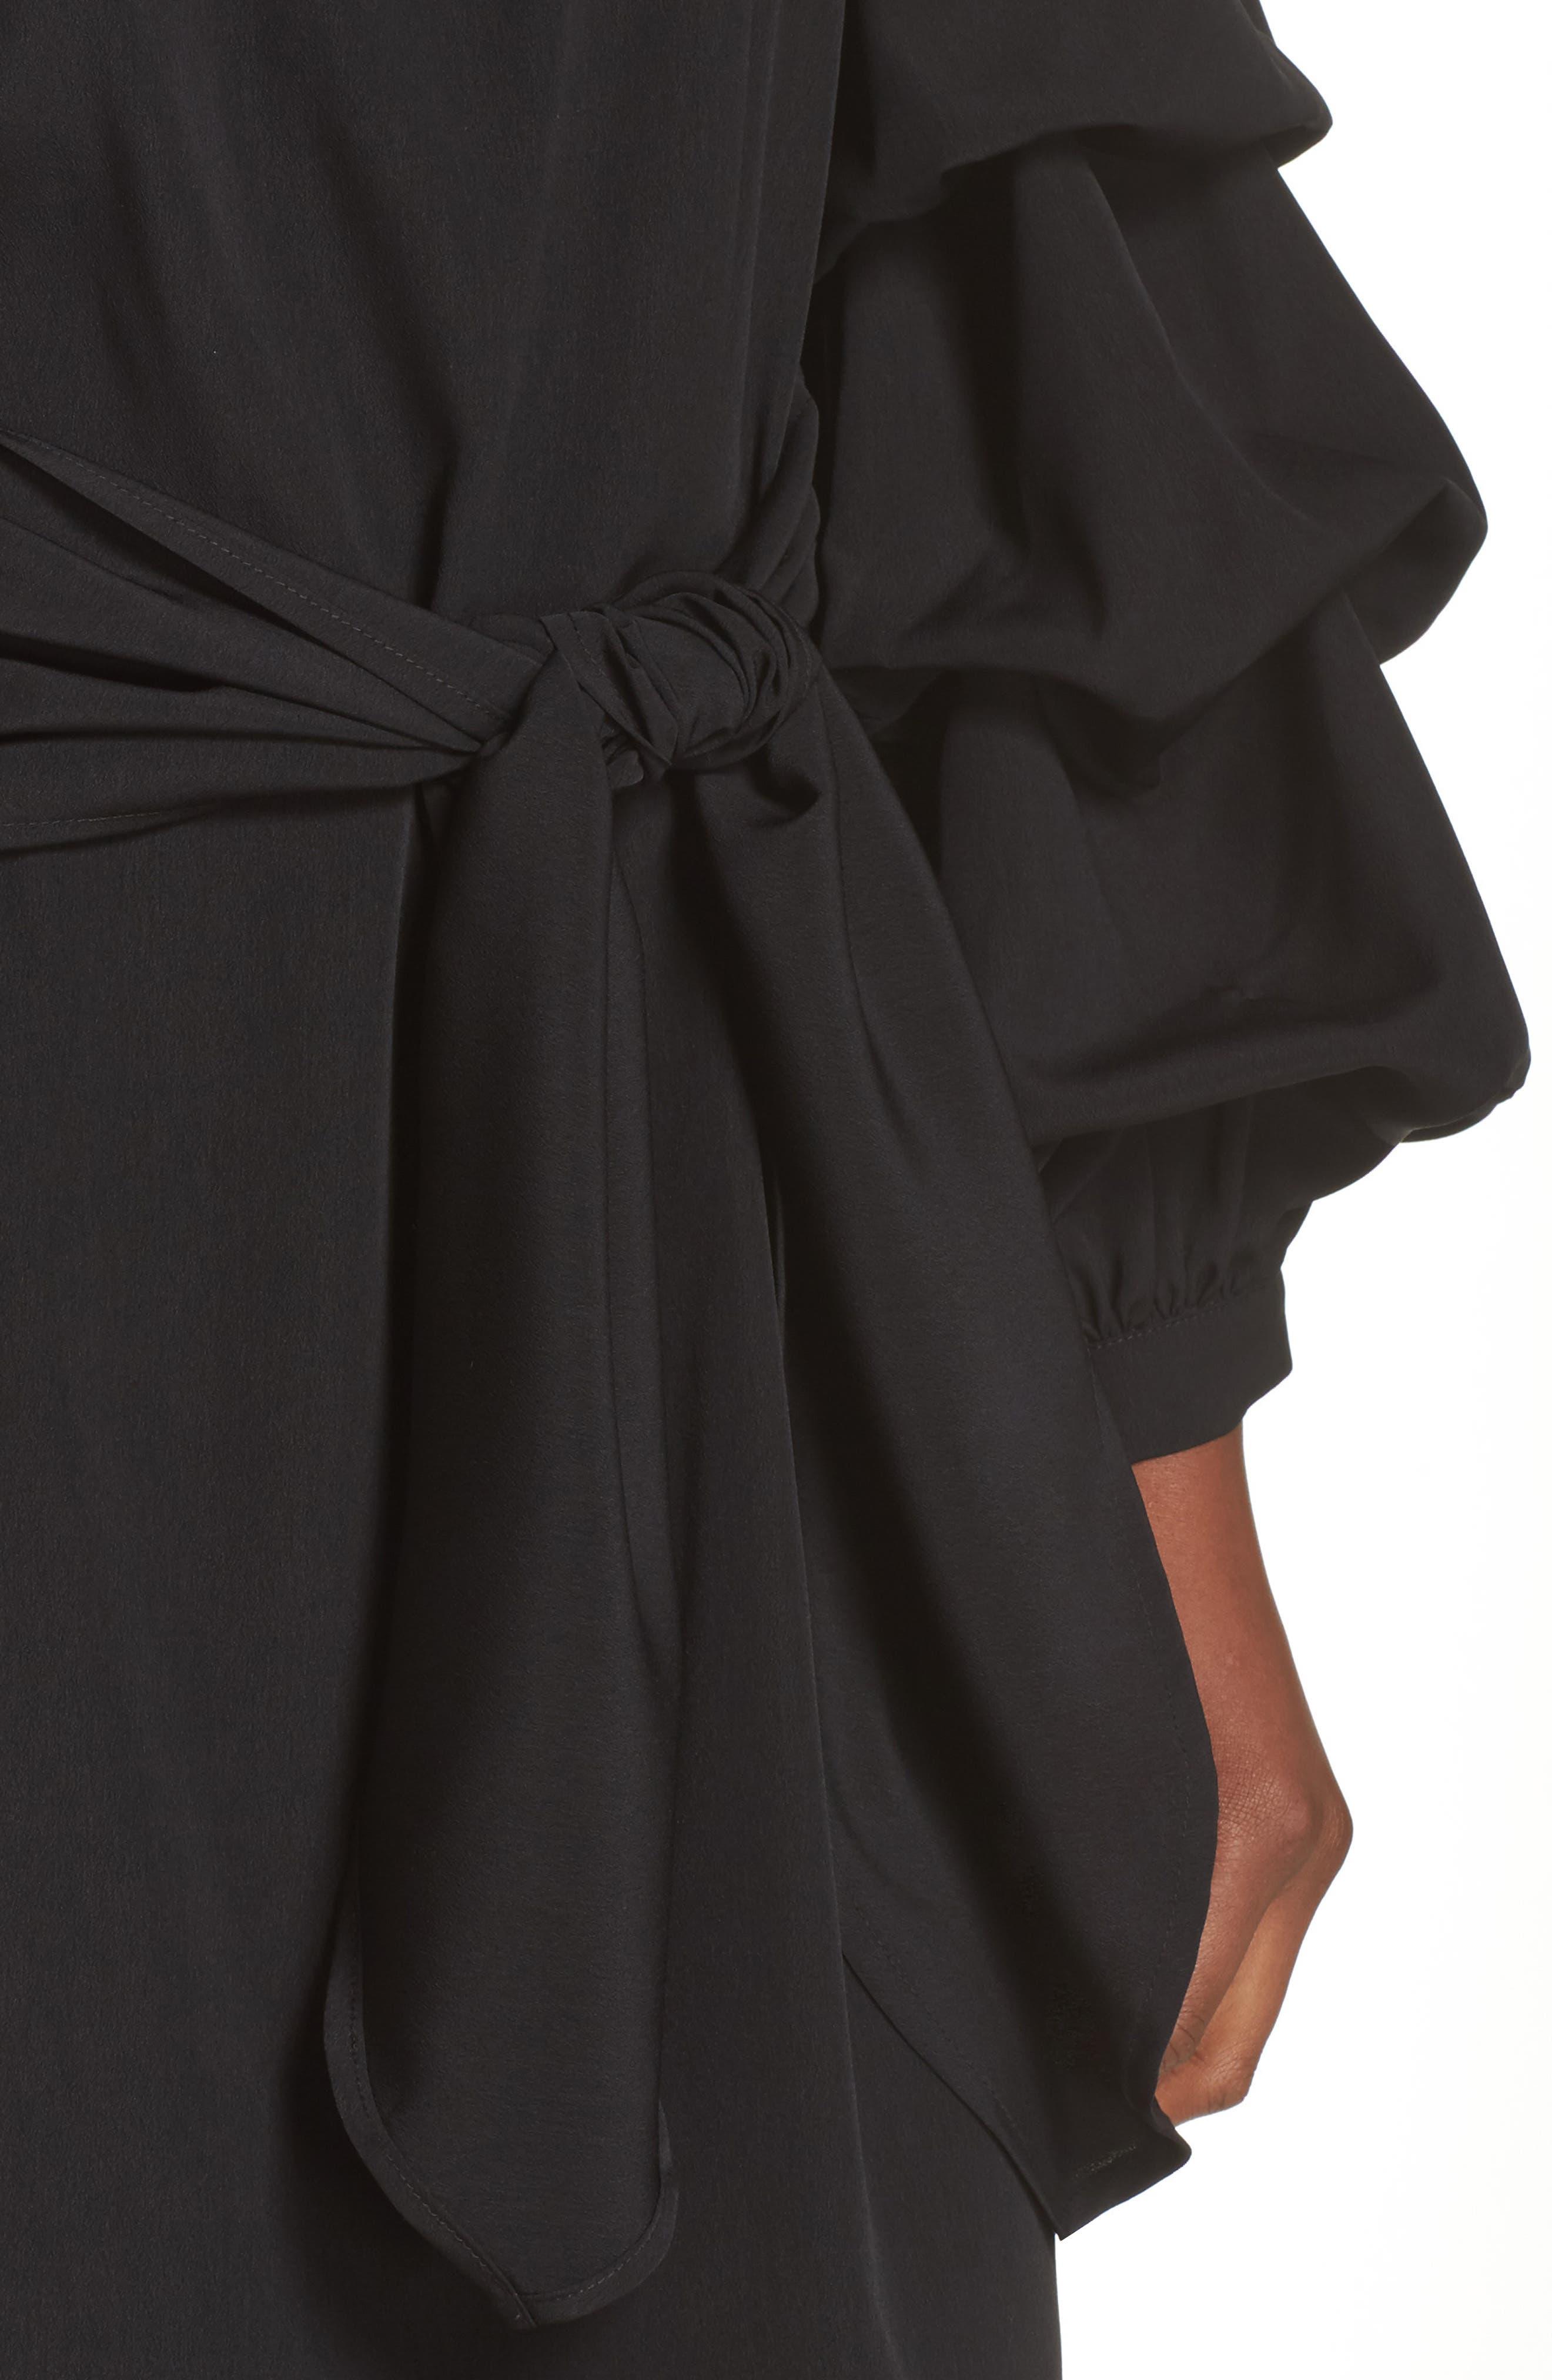 Off the Shoulder Tiered Sleeve Dress,                             Alternate thumbnail 4, color,                             Black